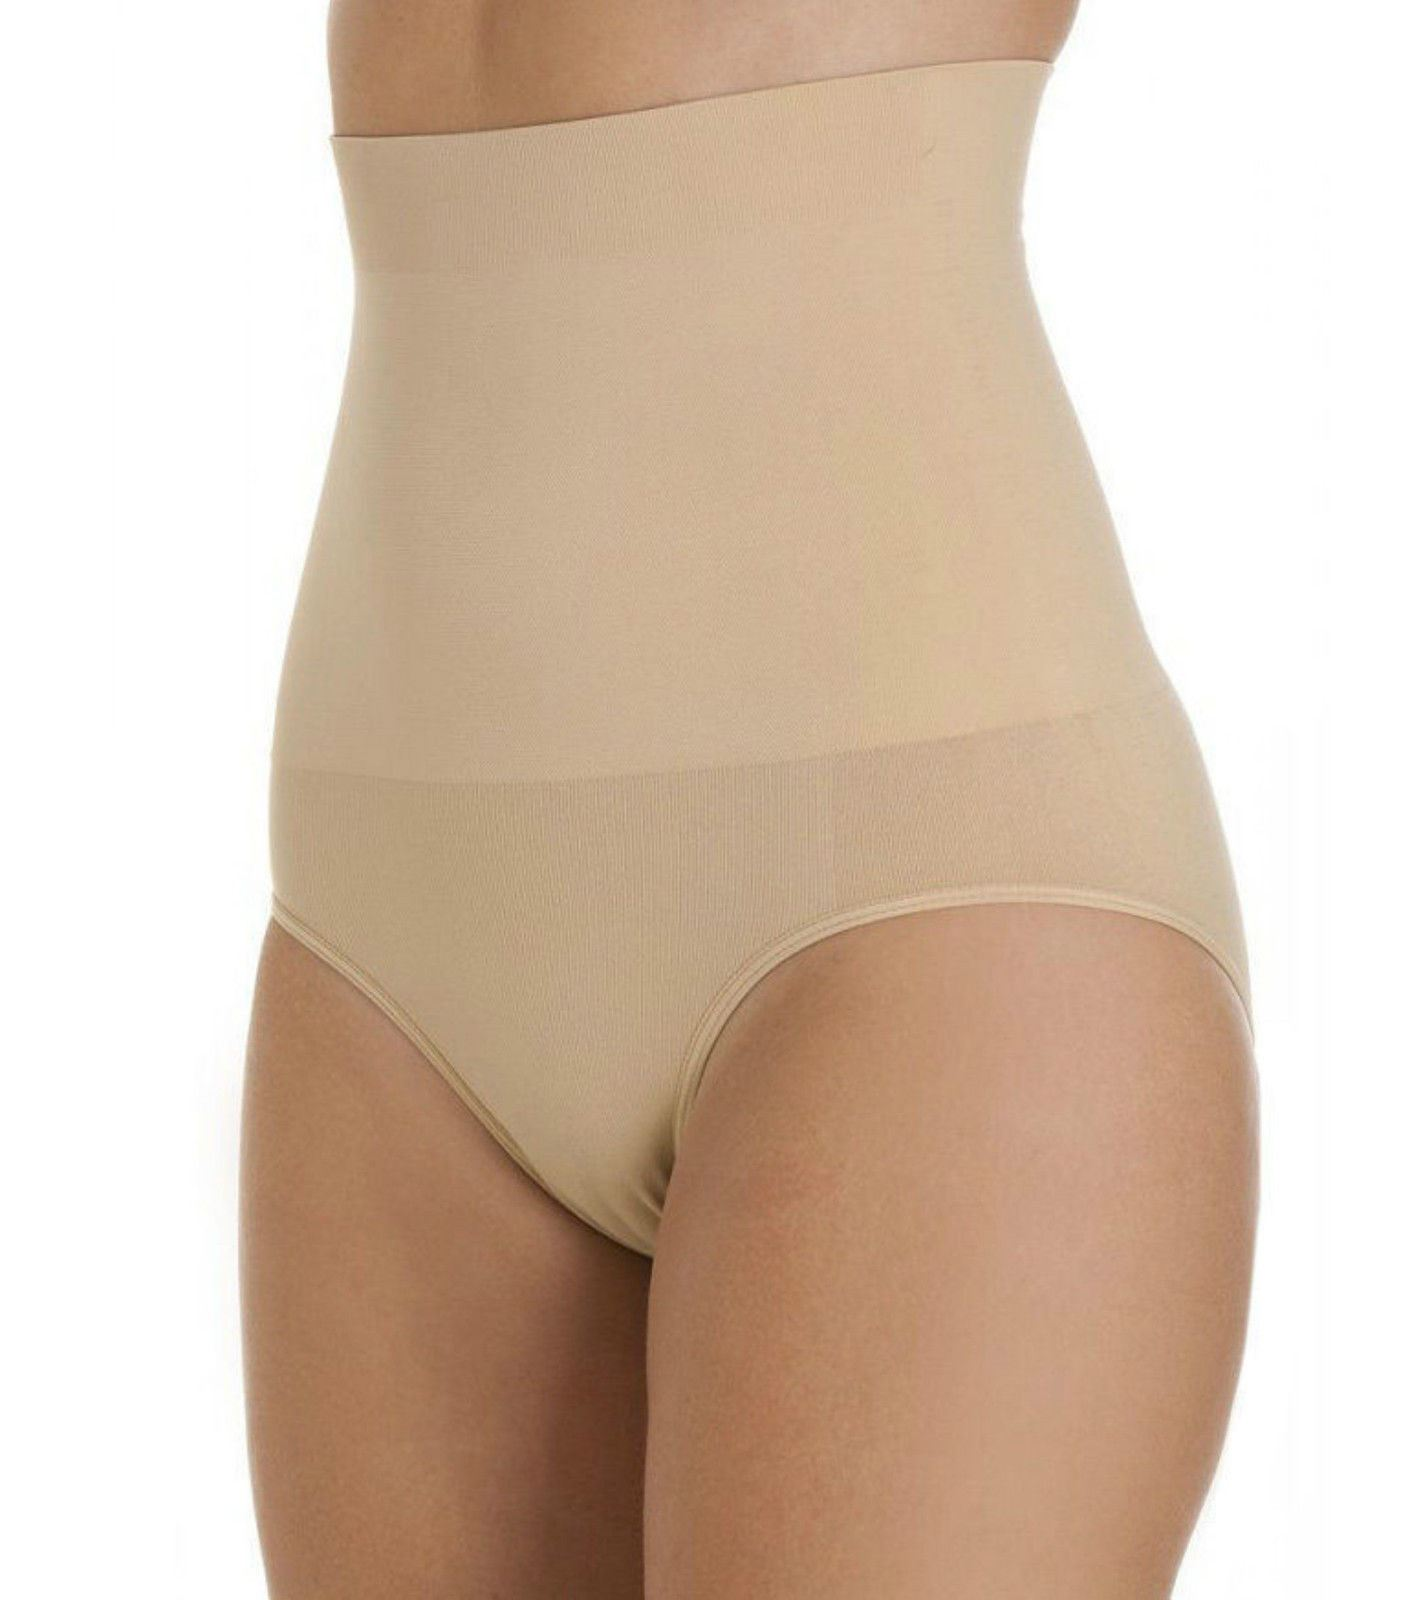 9a3a698d67fe6 Details about Control High Waist Shapewear Seamfree Slimming Briefs Tummy  Tuck Bum Lift Girdle